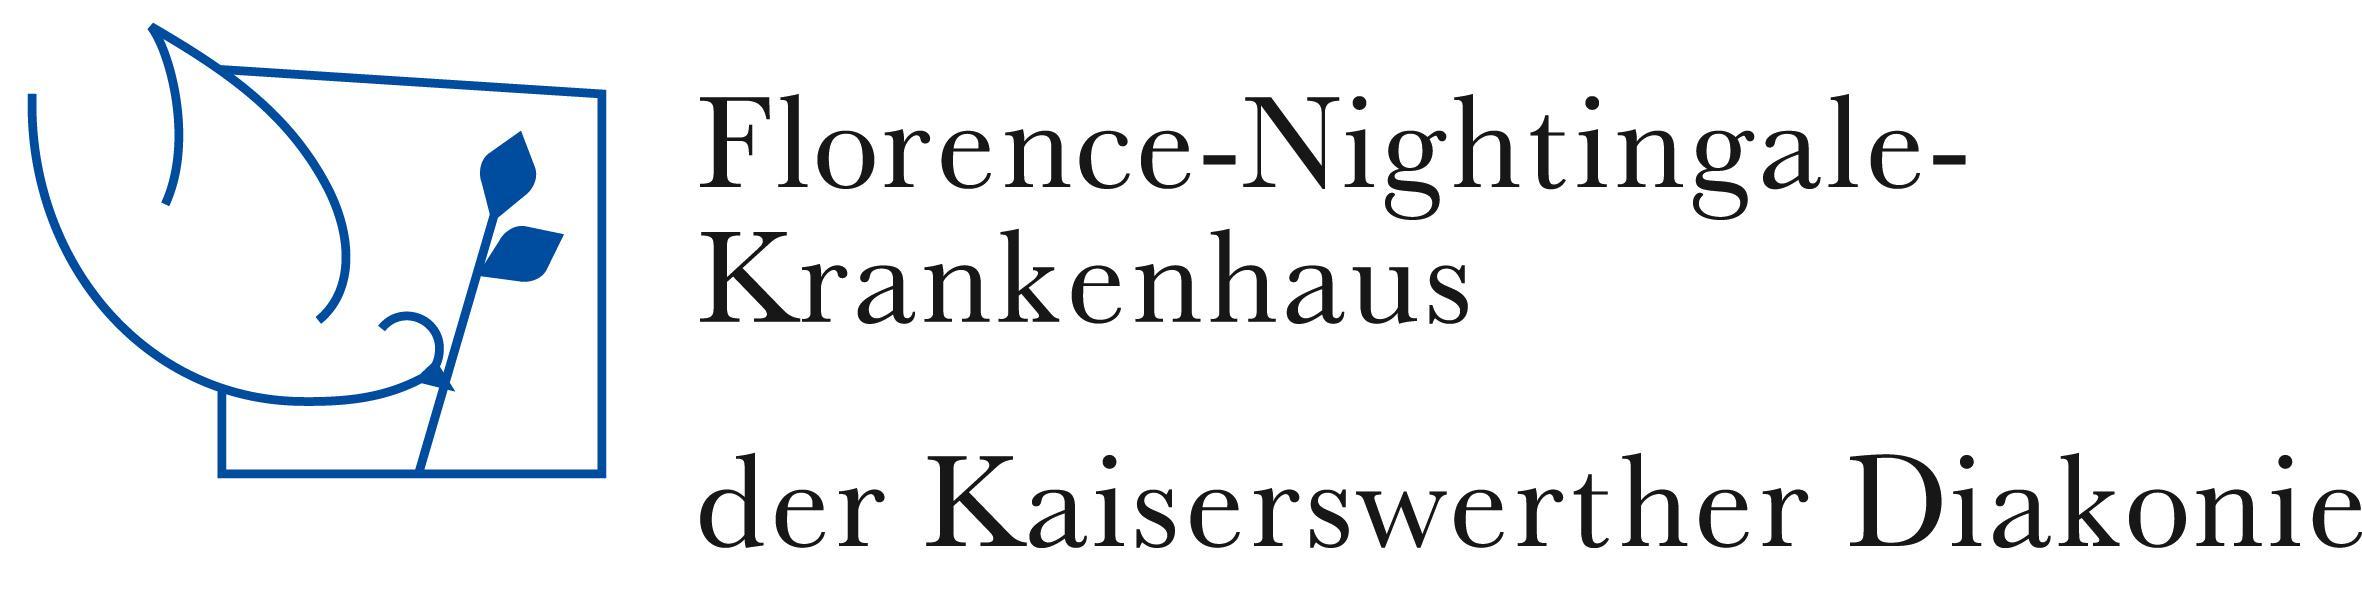 Logo: Florence-Nightingale-Krankenhaus